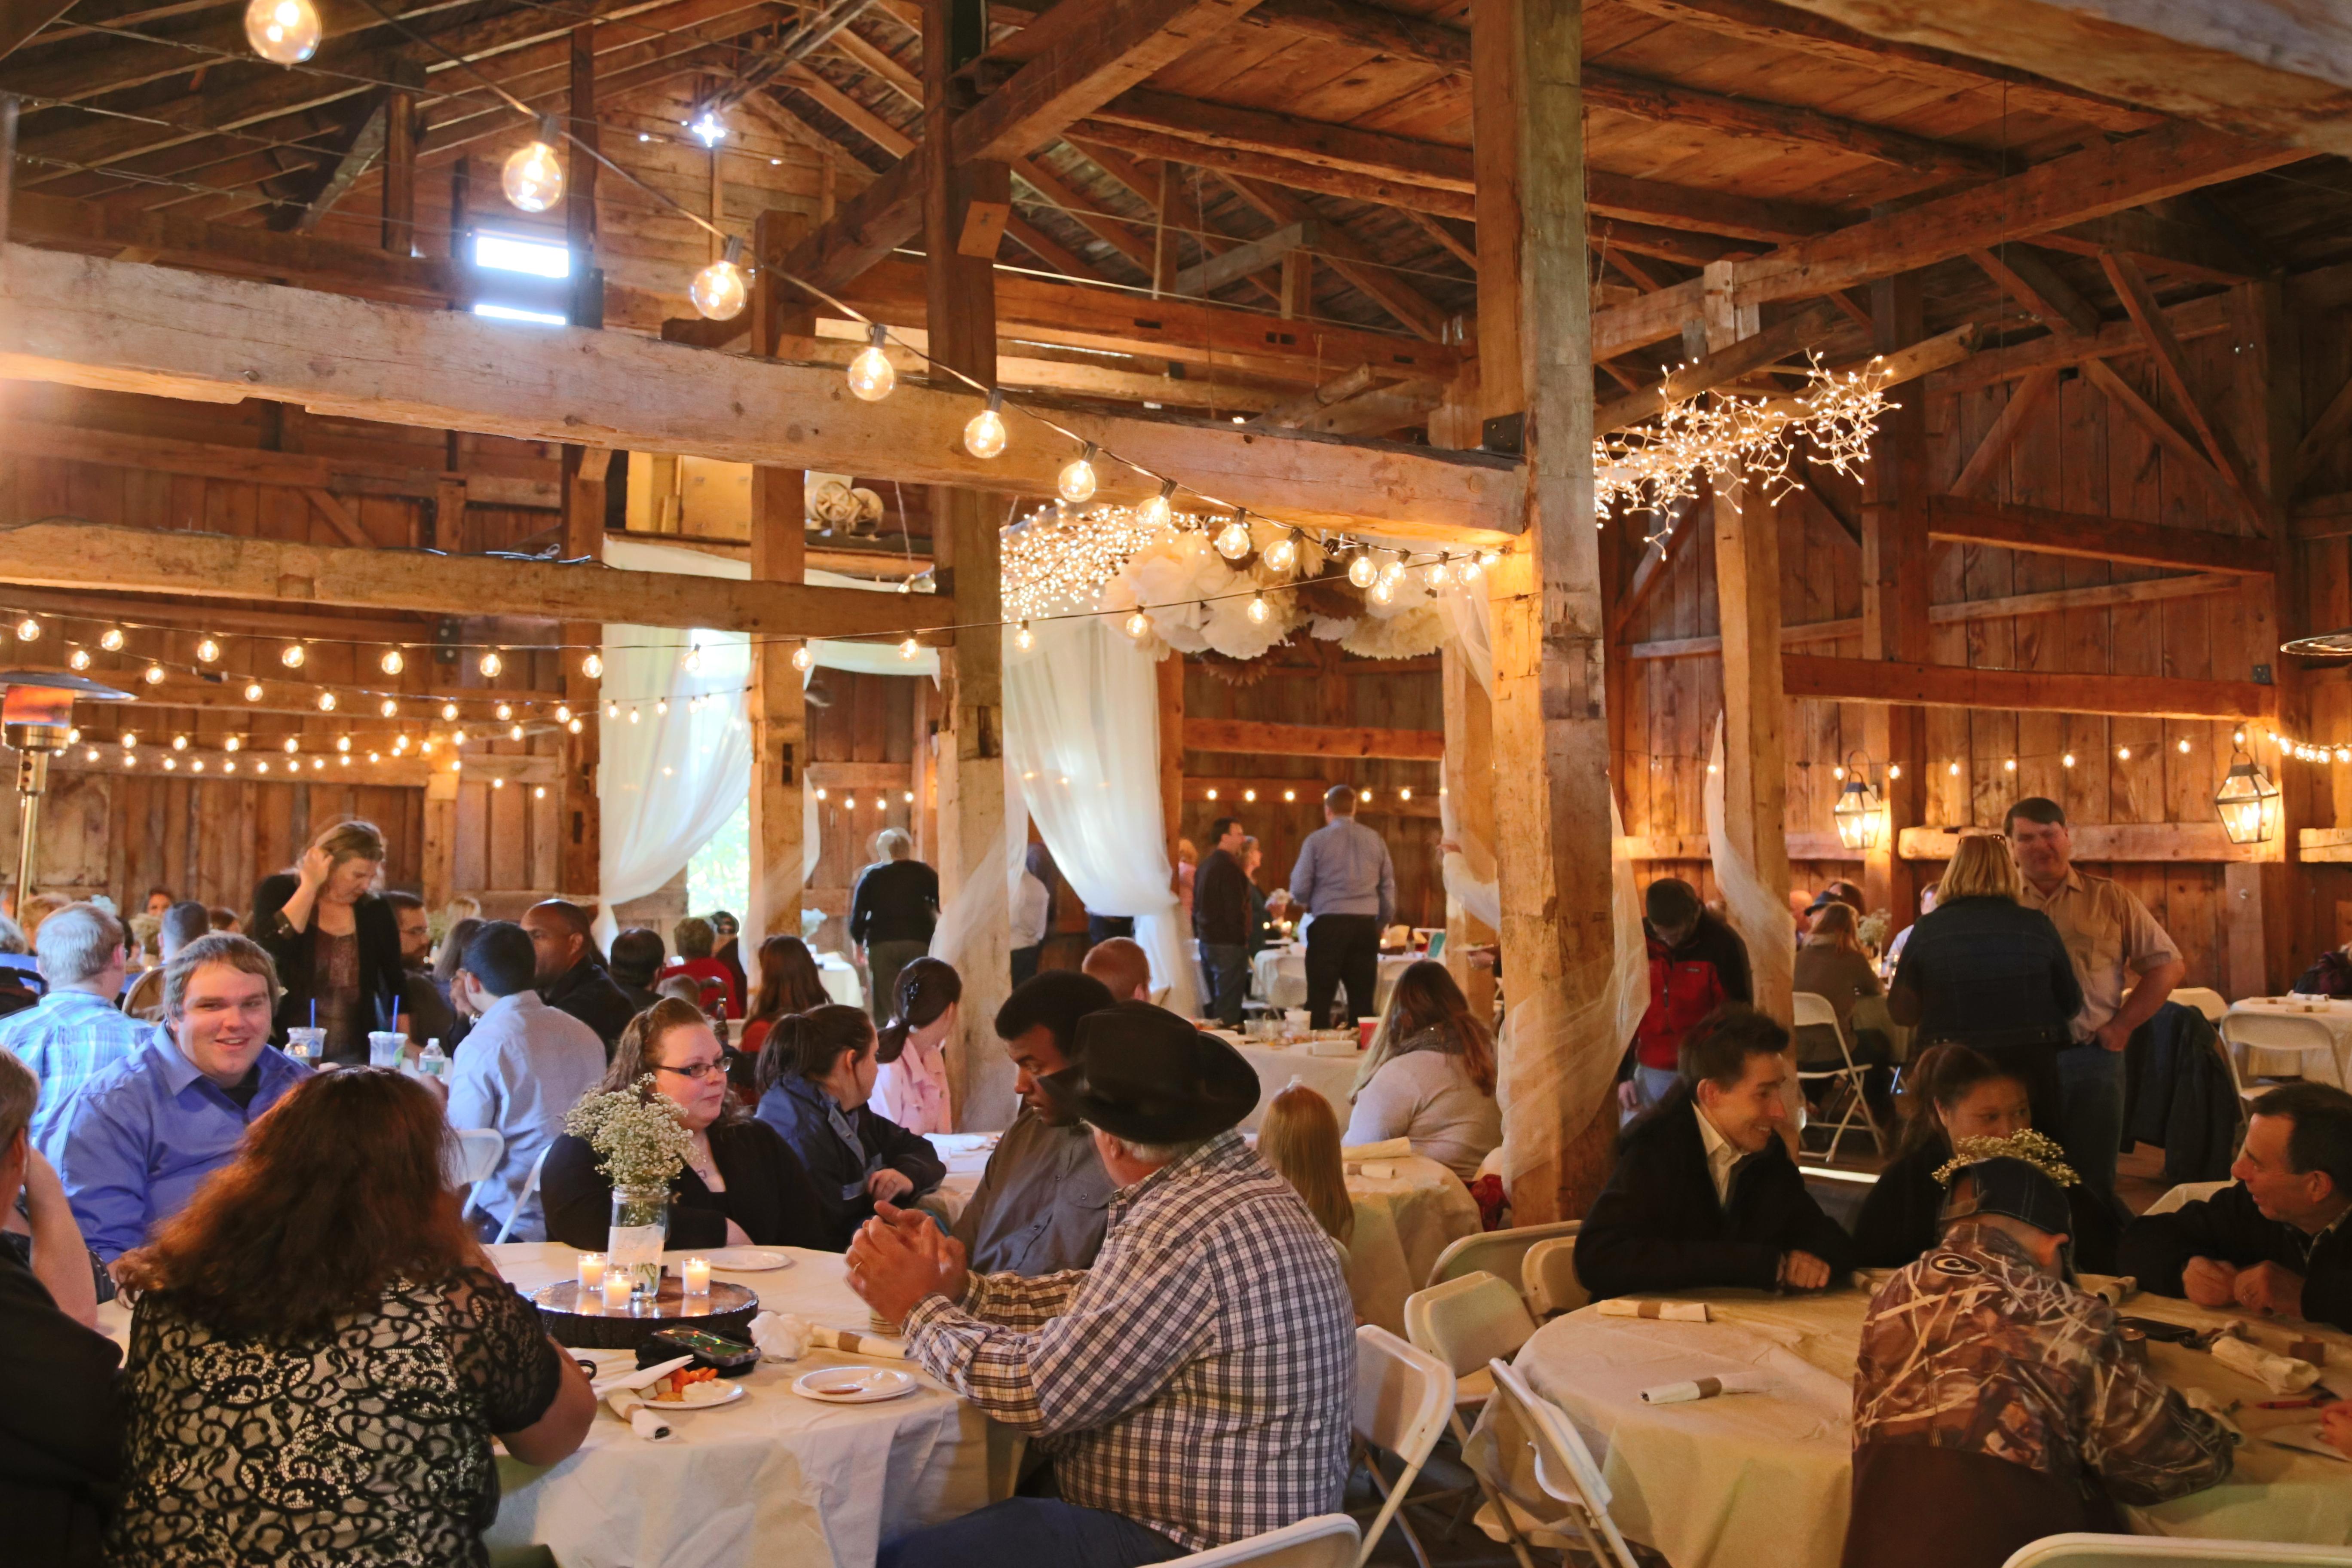 Maine   Rustic Bride   Barn Wedding Venues, Farm Wedding ...